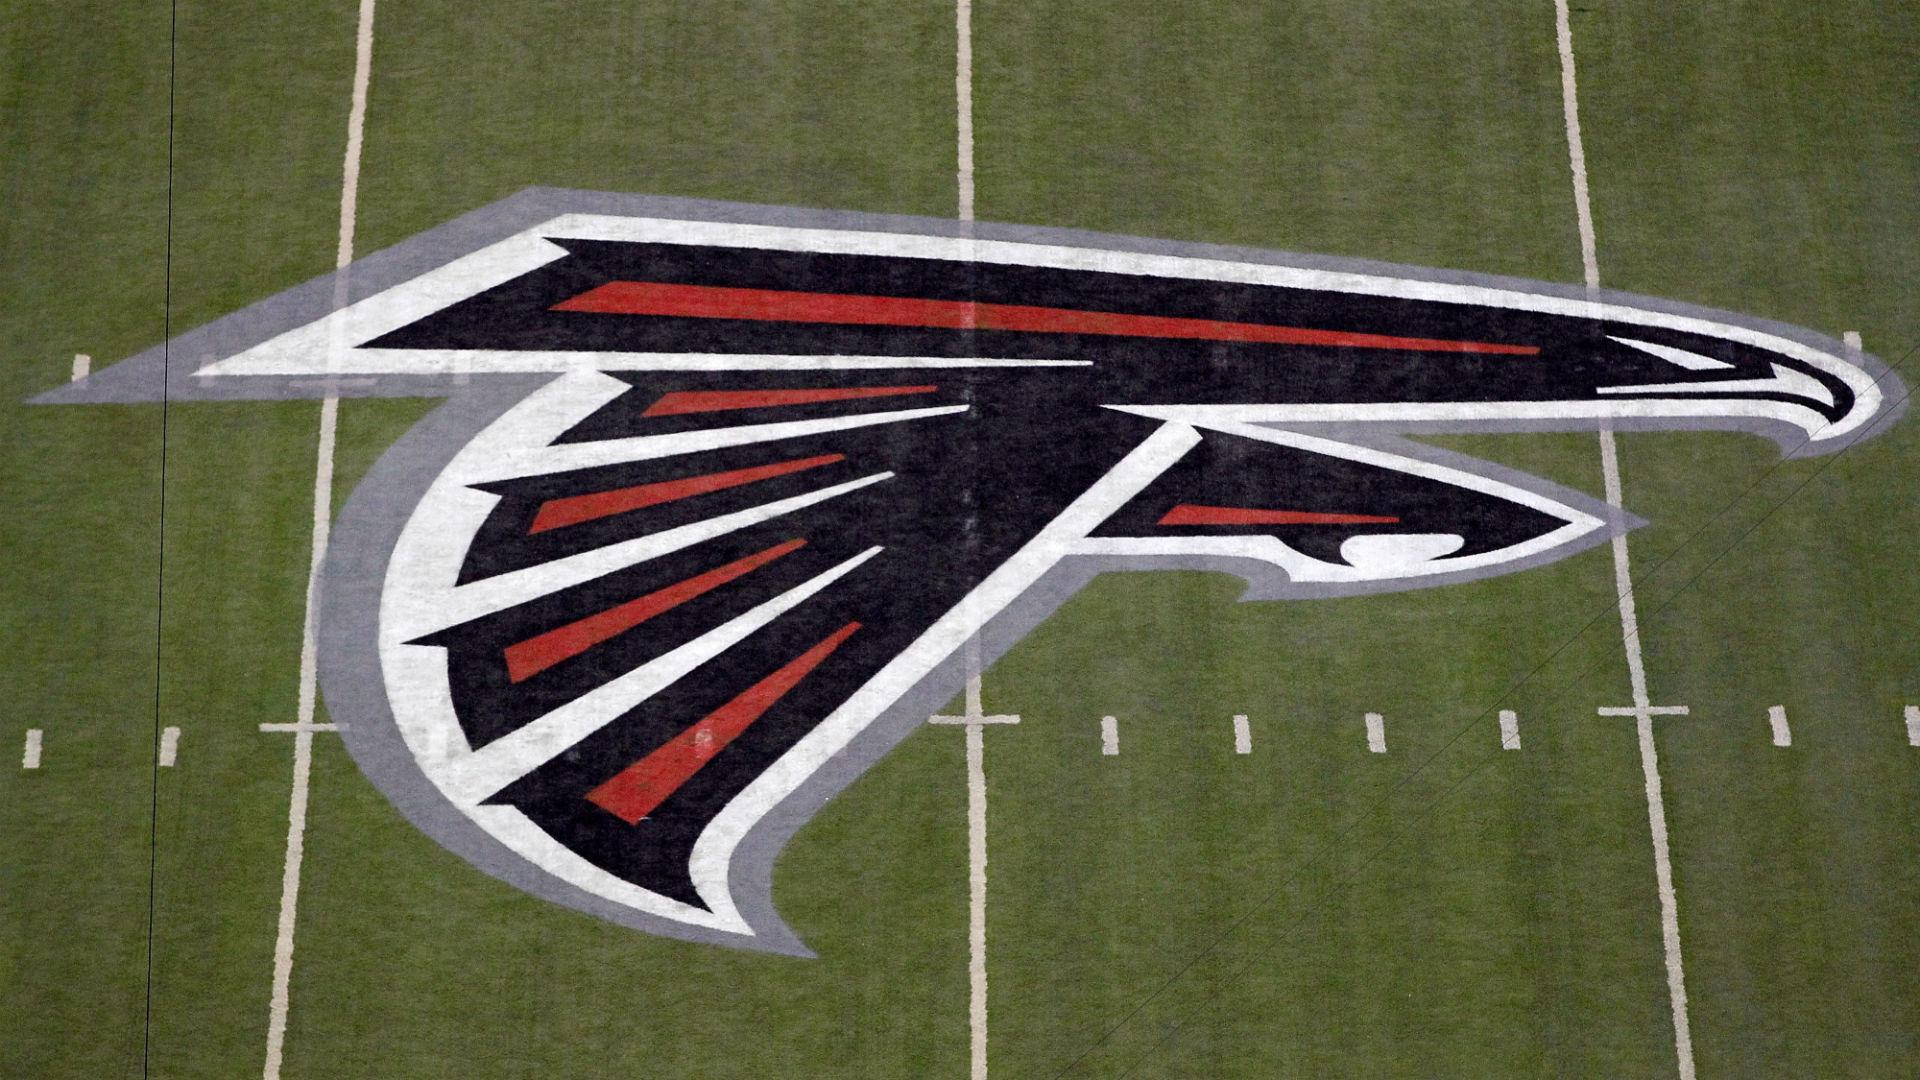 Atlanta-falcons-10715-usnews-getty-ftr_1r5dqcjganv191wr1sca21h8wh